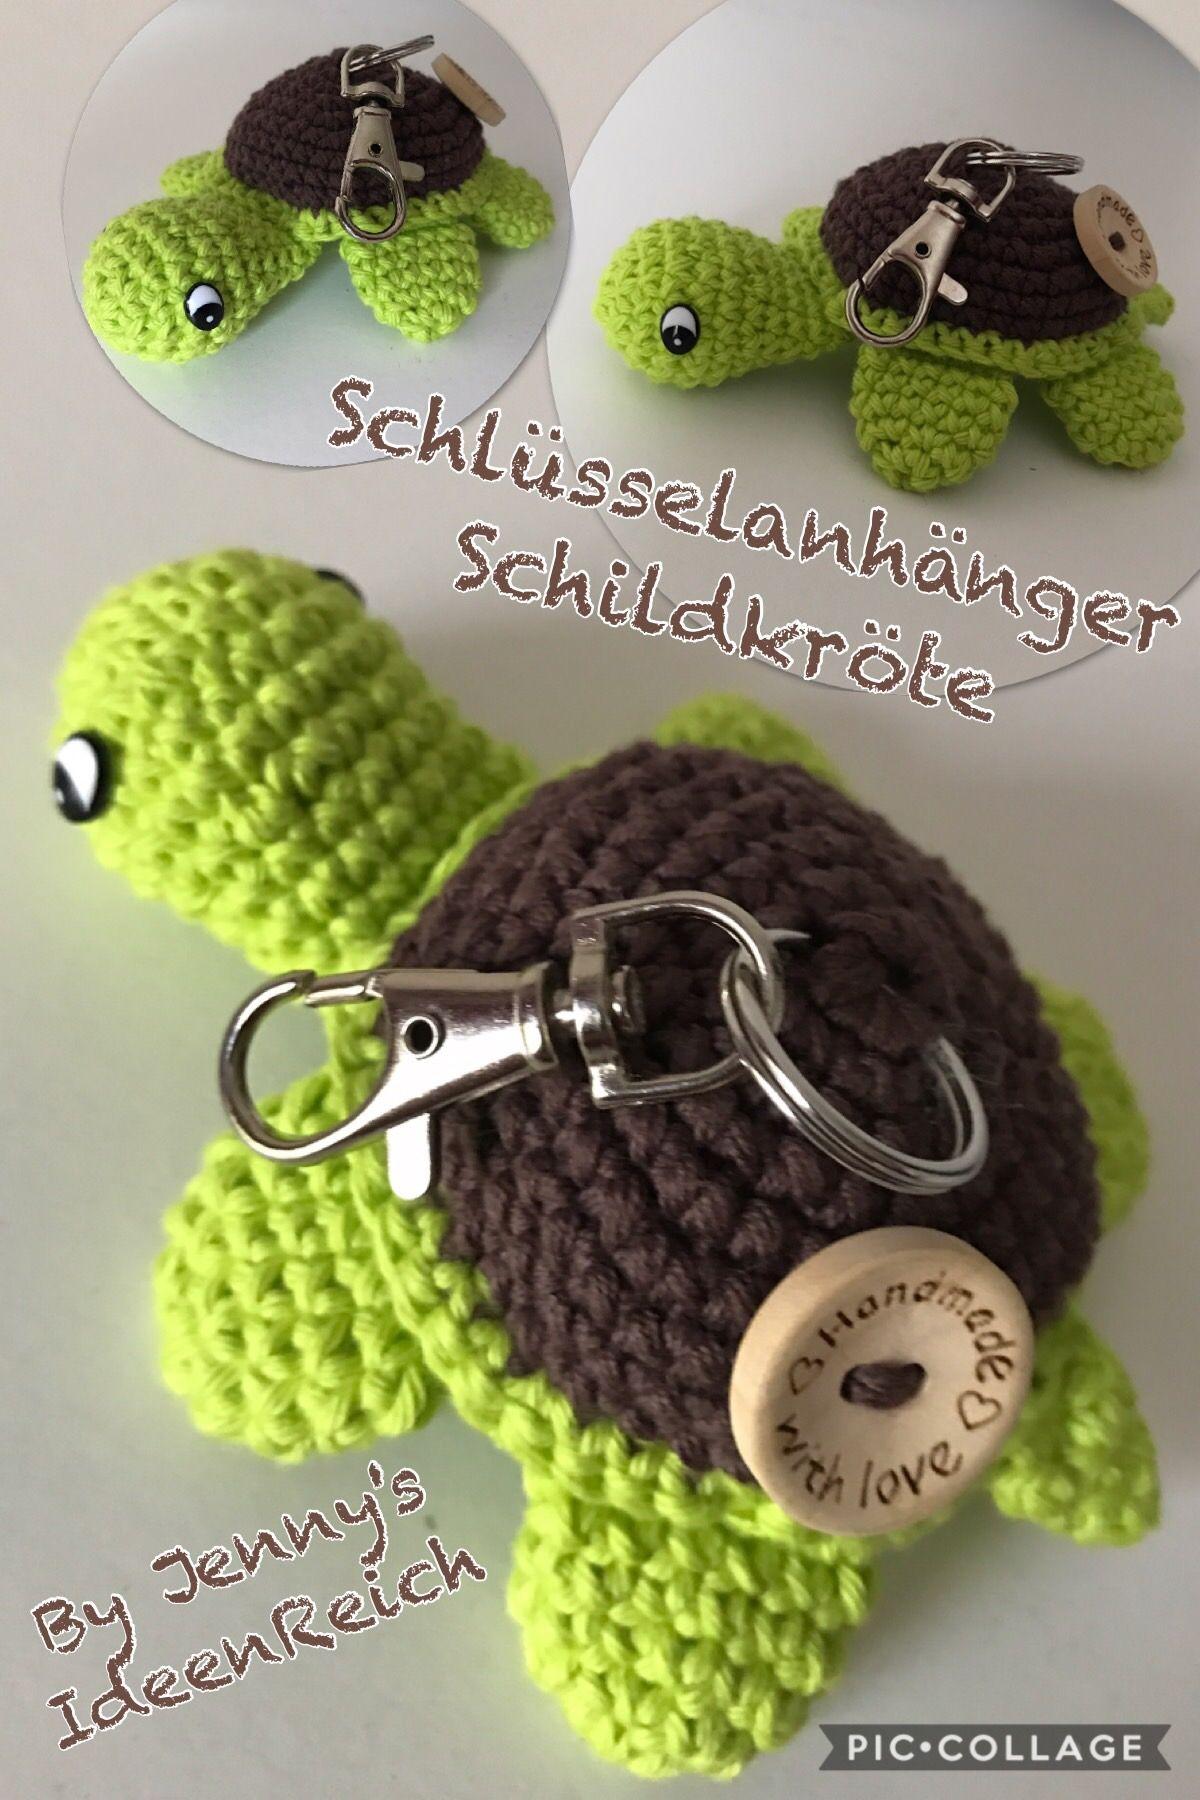 Schlüsselanhänger Schildkröte Häkeln Häkeln Häkeln Anleitung